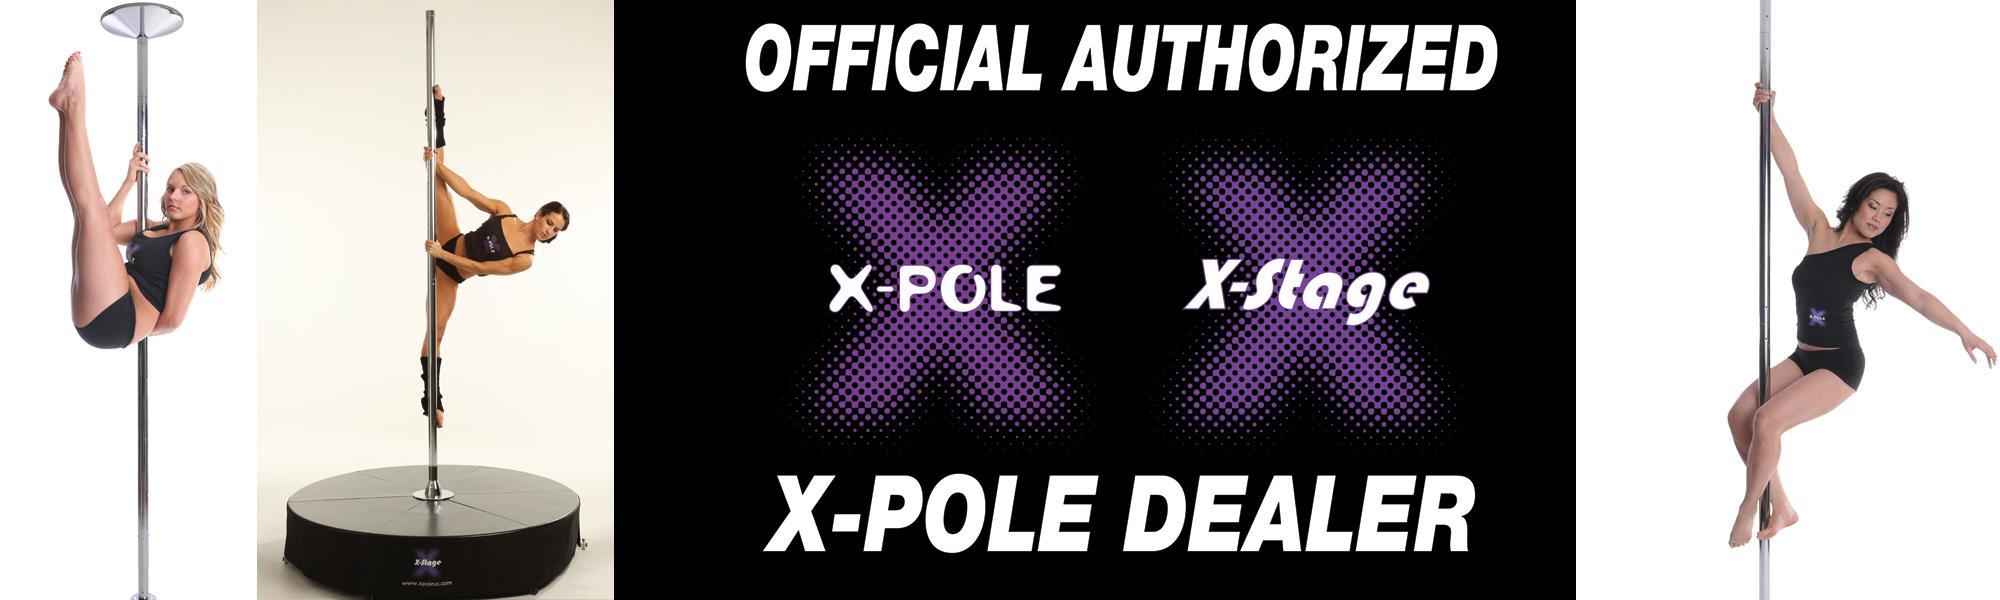 XpoleHeader2.jpg